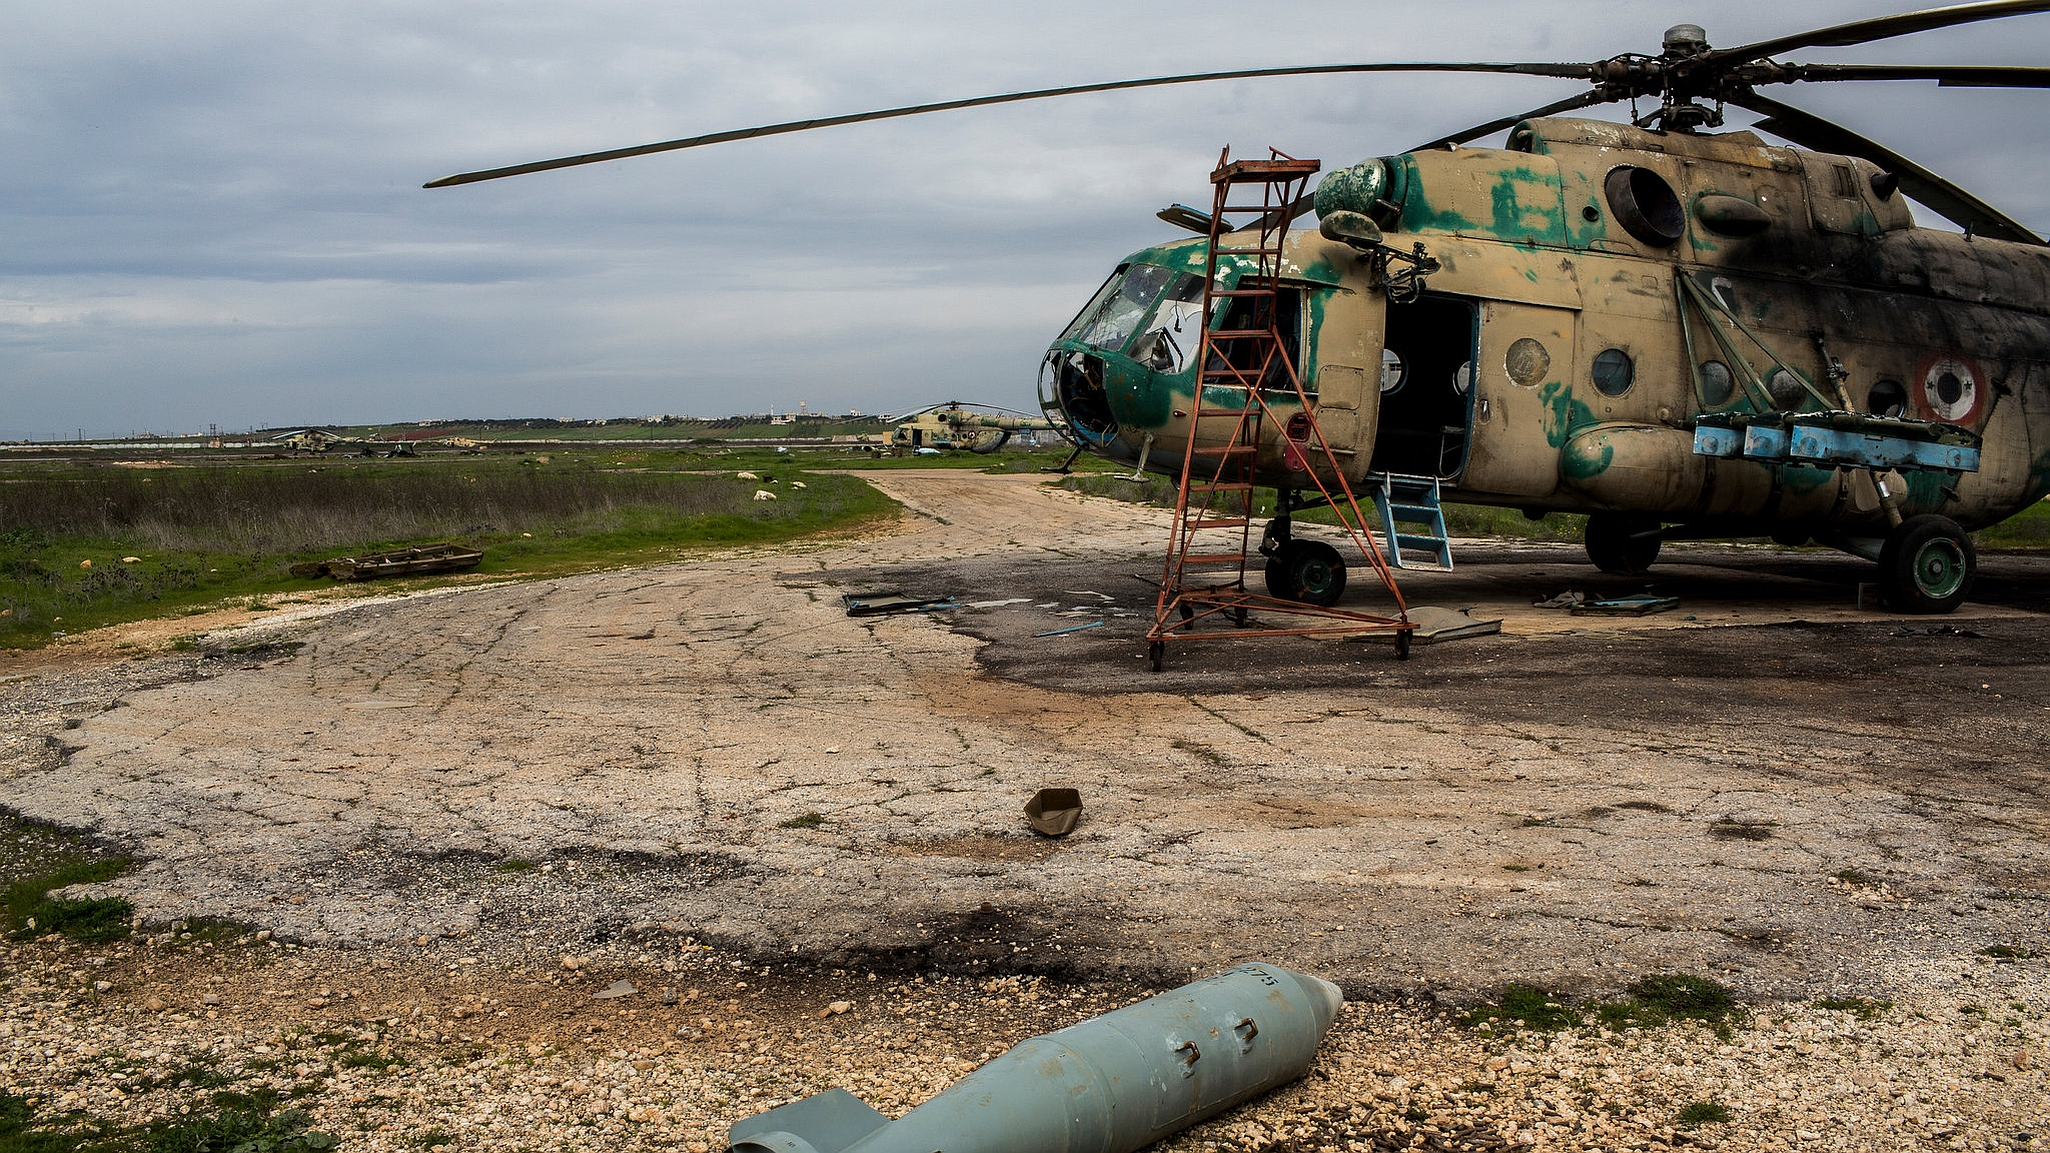 Helicoptero Hd Fondos De Escritorio: Militar Helicóptero Fondo De Pantalla